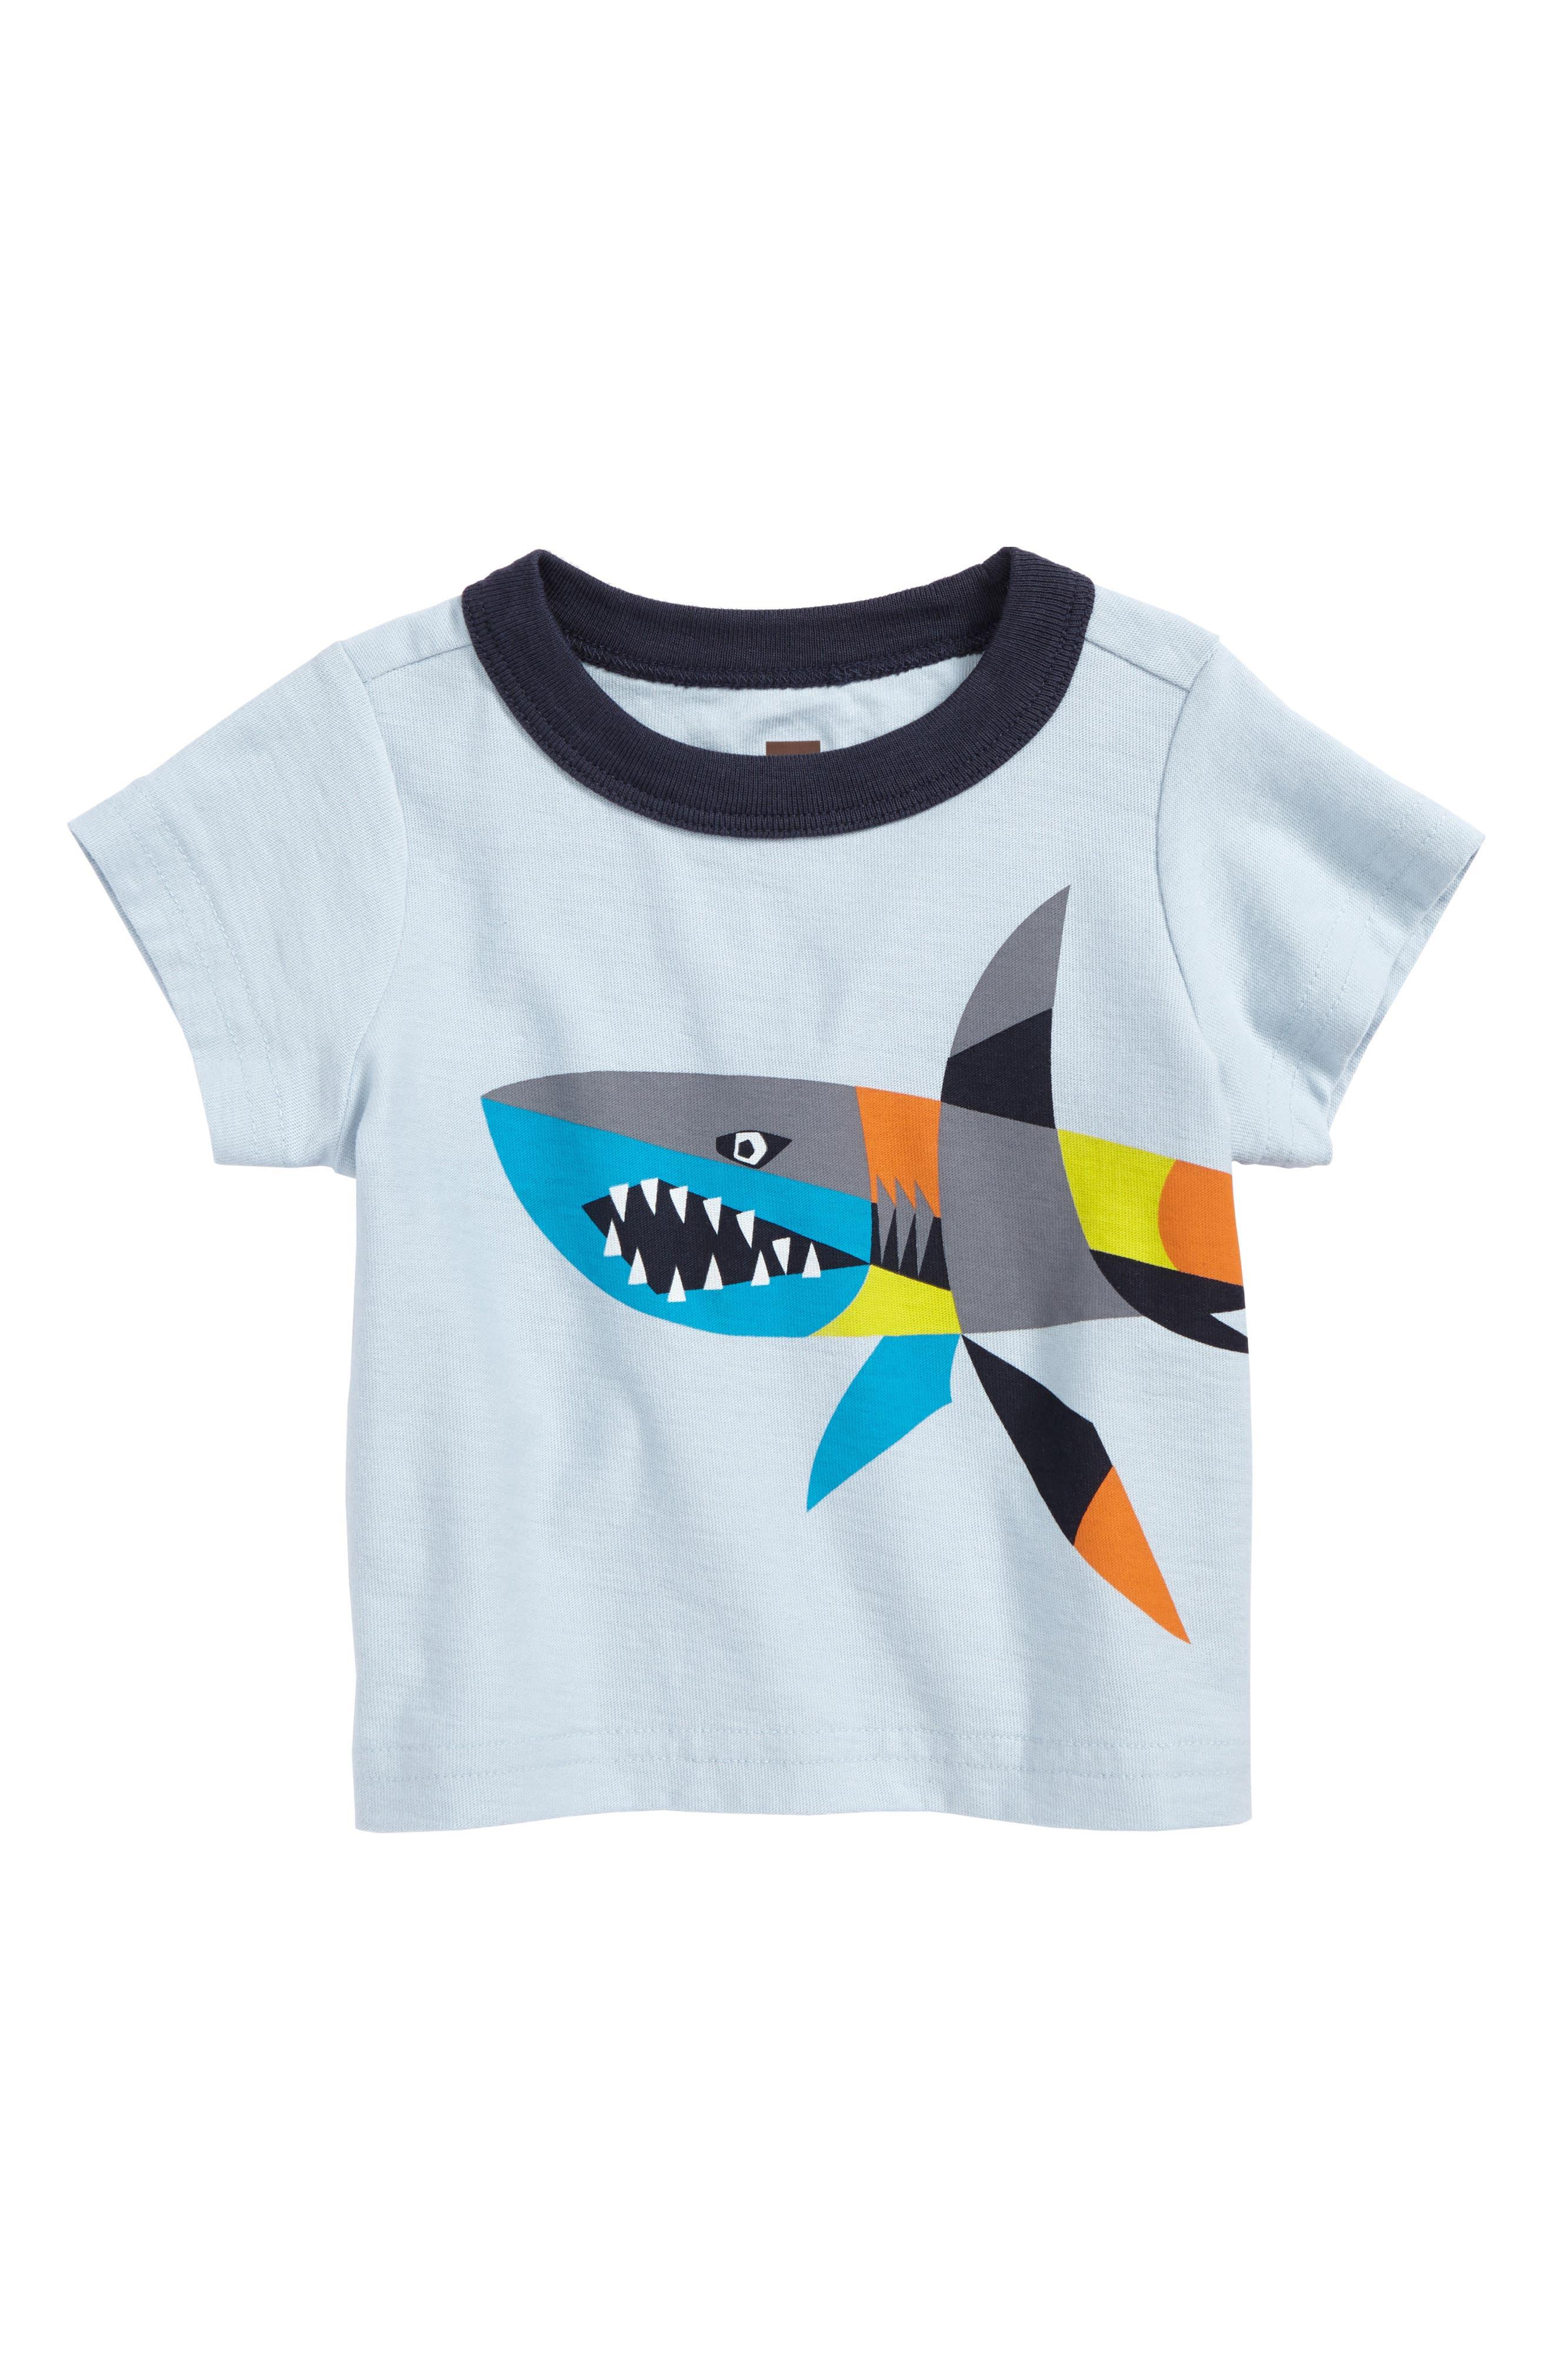 Chomper T-Shirt,                         Main,                         color, 020